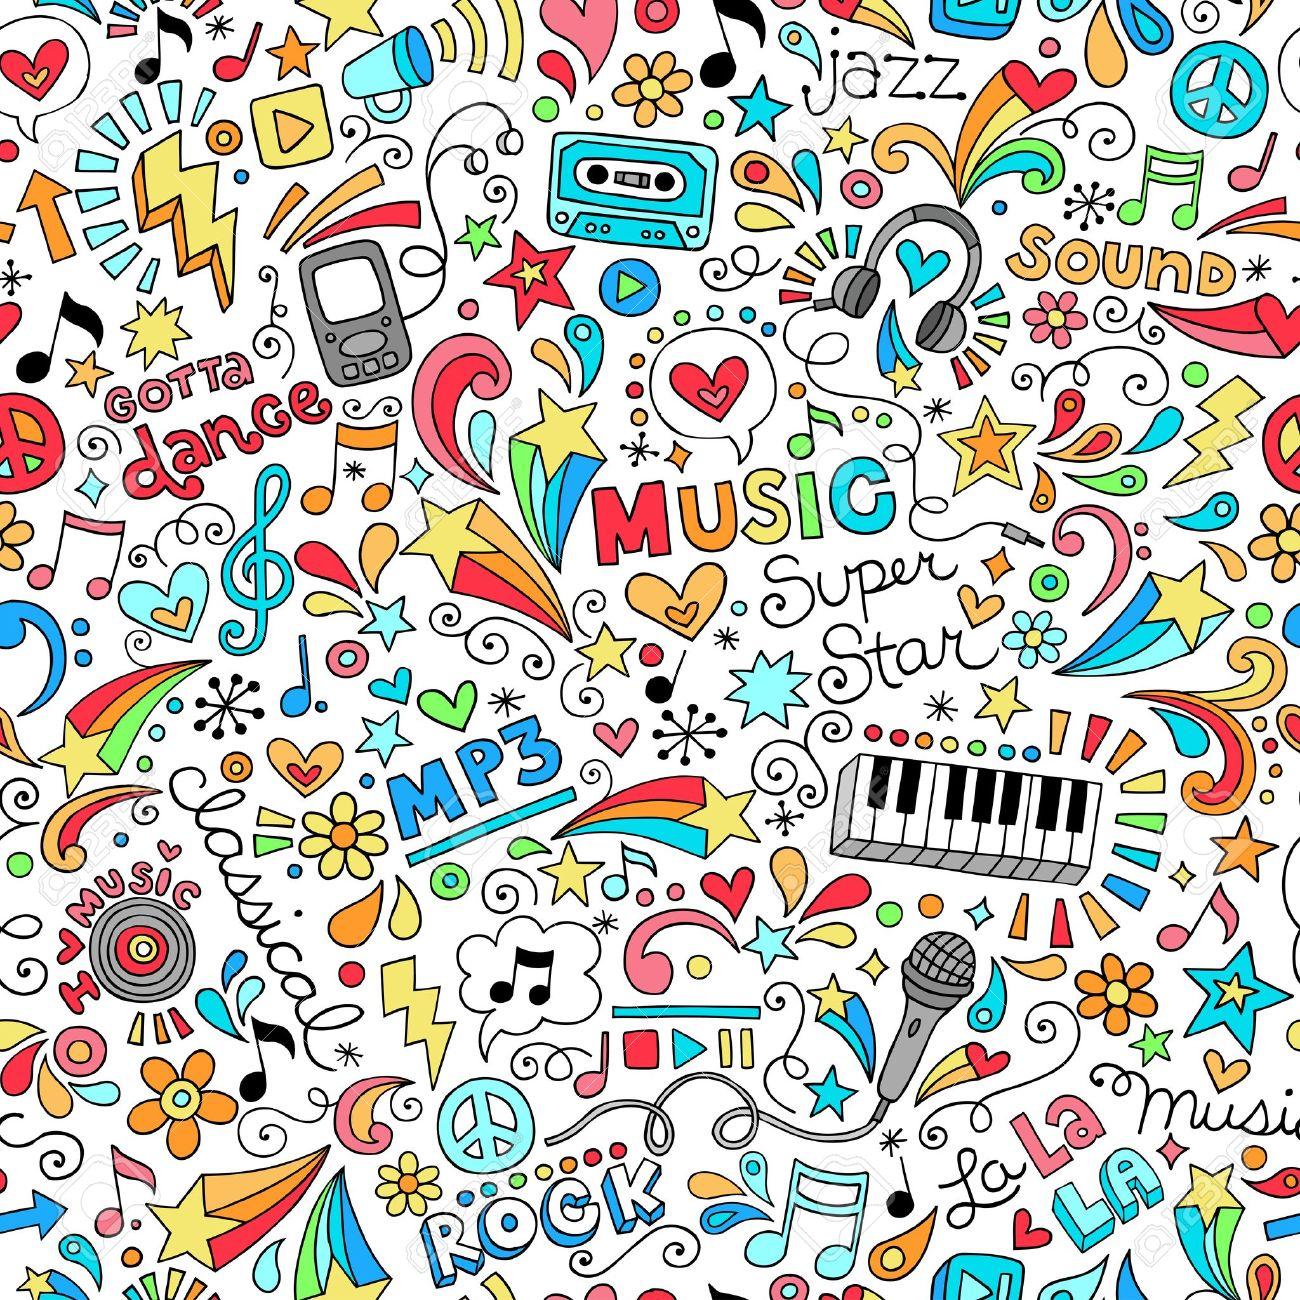 Music Groovy Doodles Vector Illustration Hand-Drawn Design Elements Stock Vector - 17164989